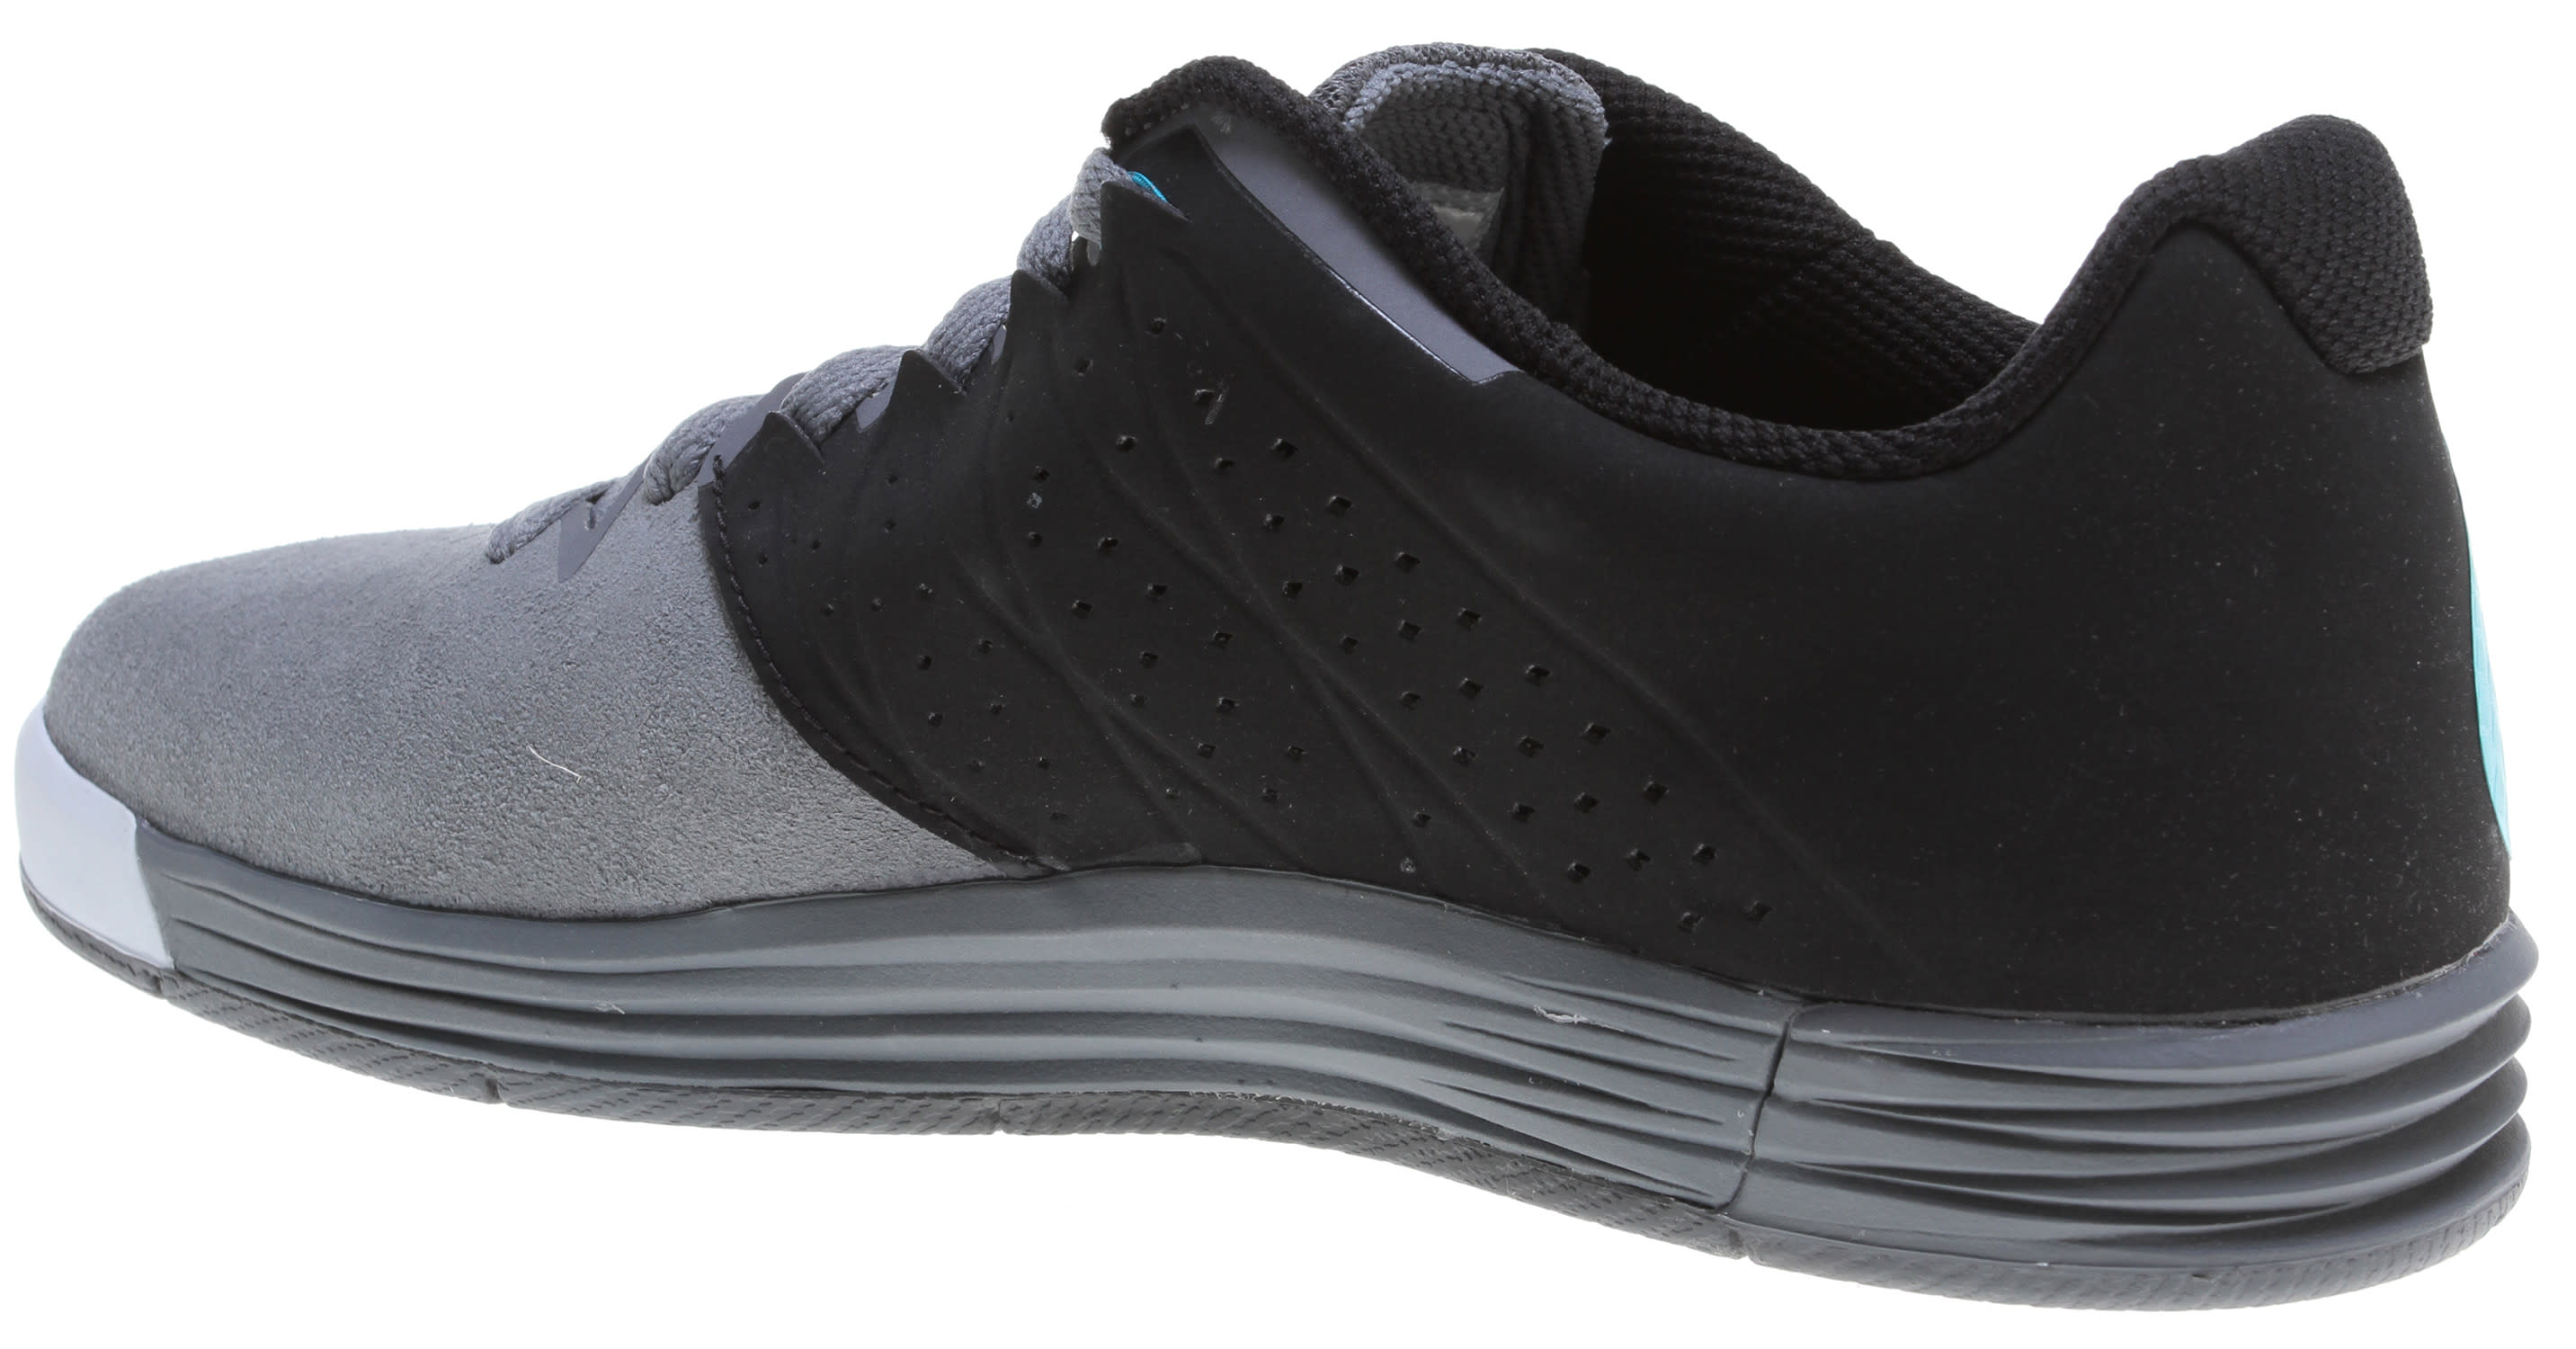 Nike Sb Paul Rodriguez Ctd Skate Shoes